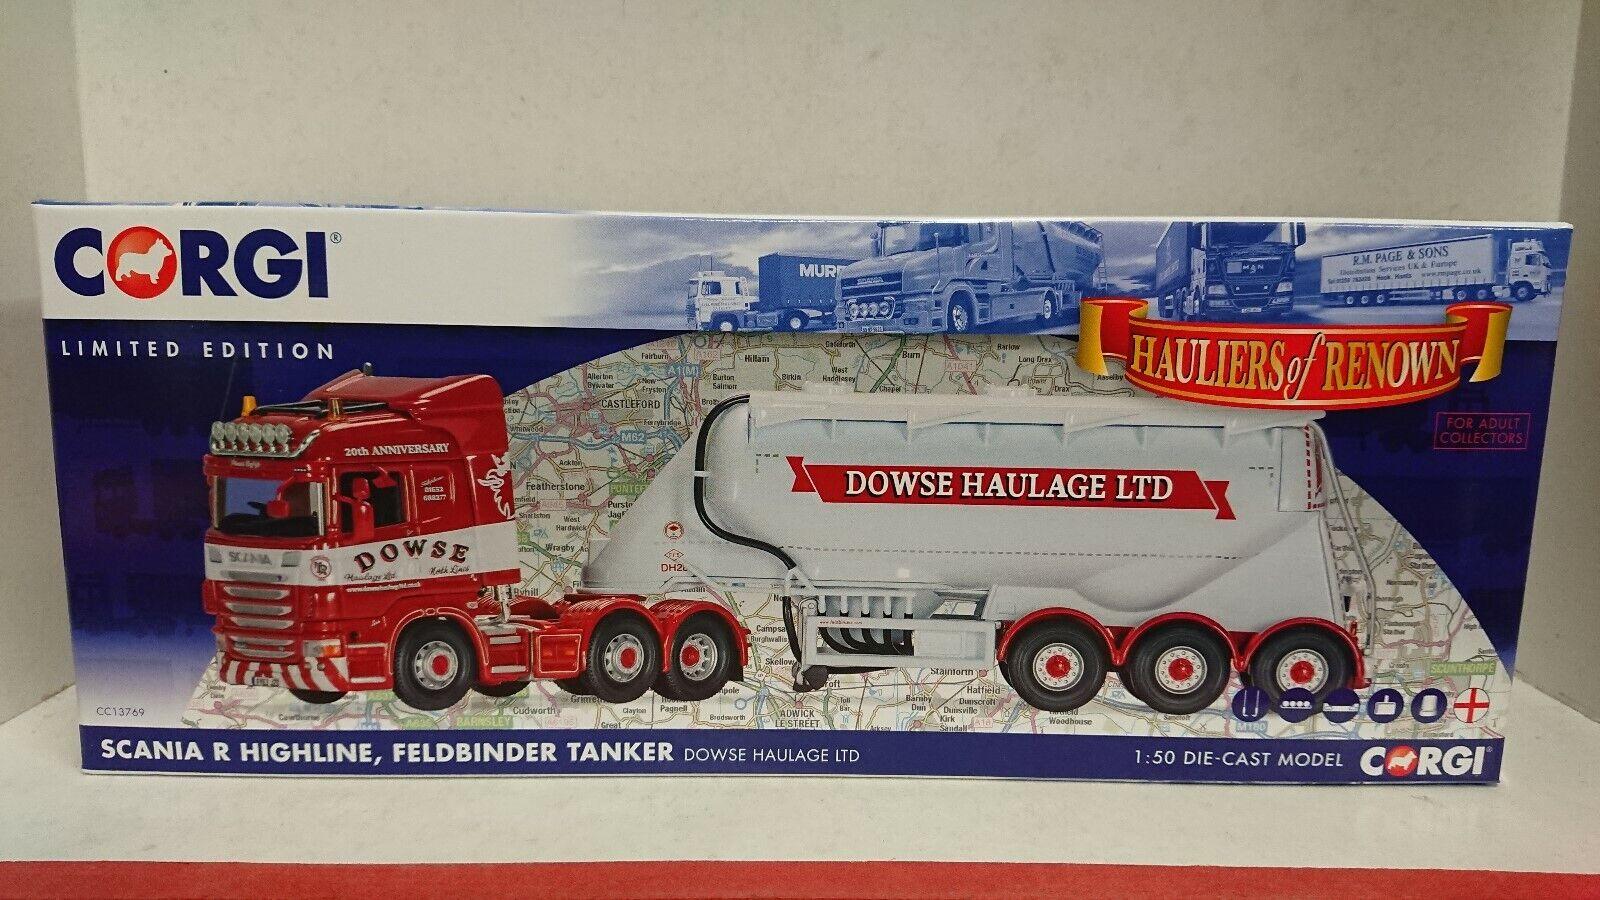 Corgi CC13769 Scania R Feldbinder Tanker Dowse Haulage Ltd Edition of 800